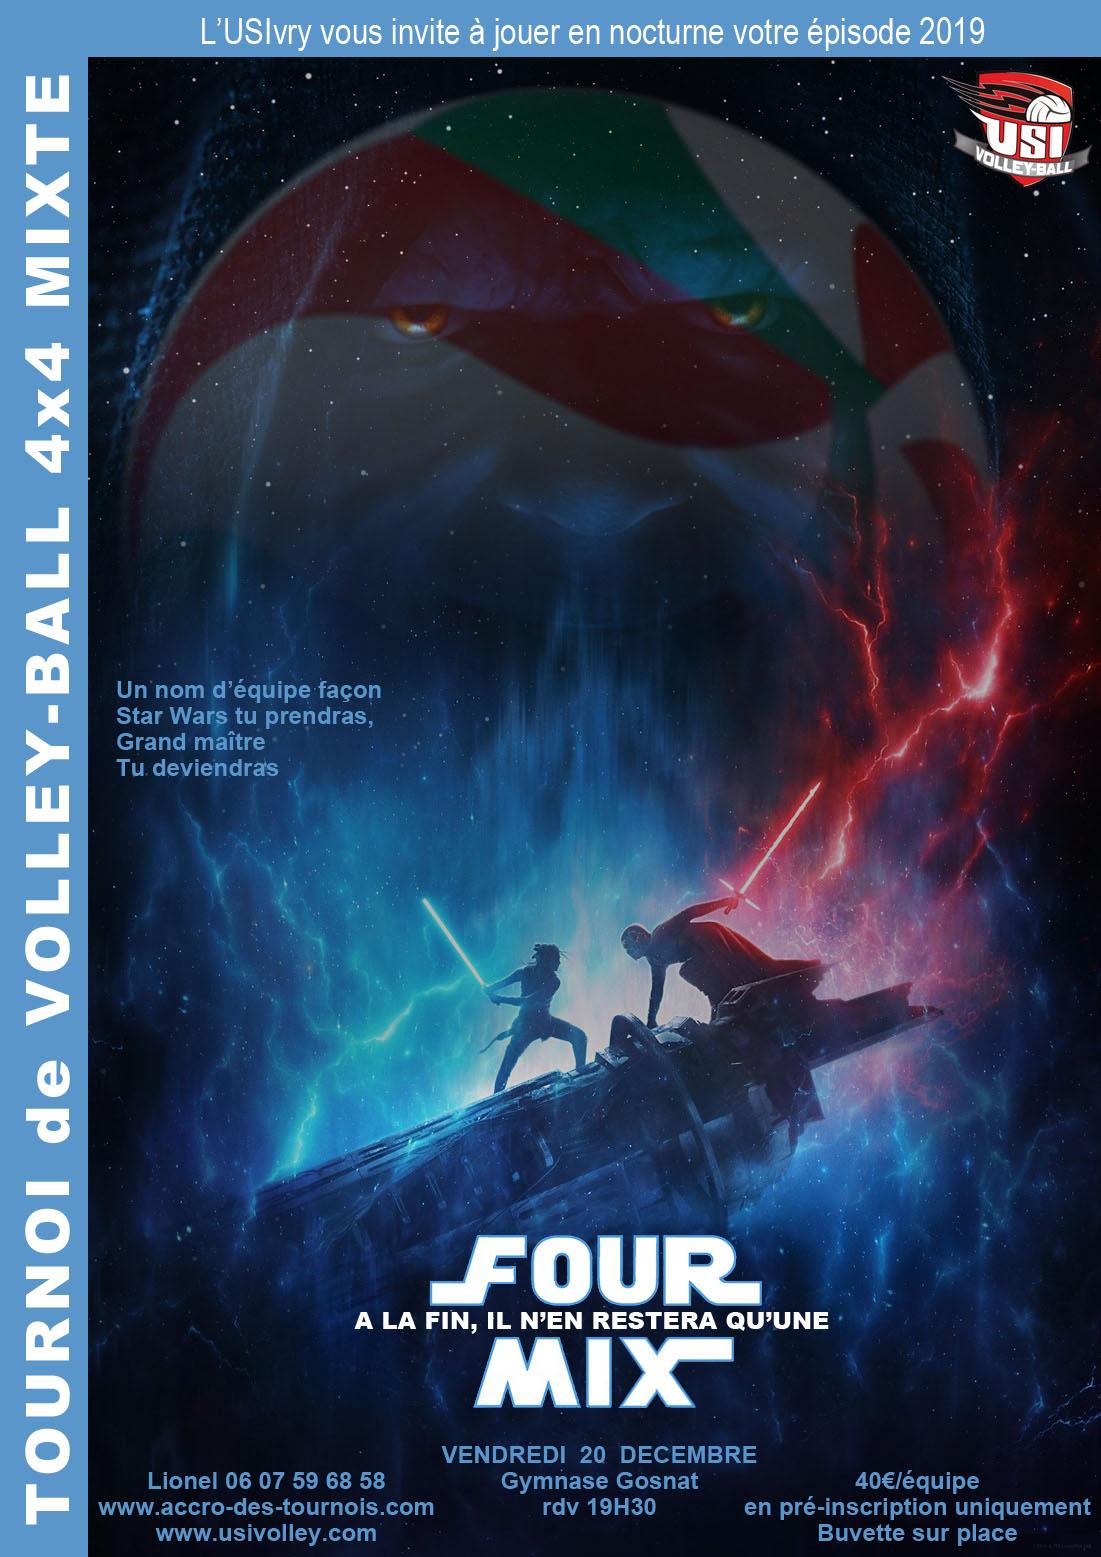 Tournoi Nocturne Fourmix 2019